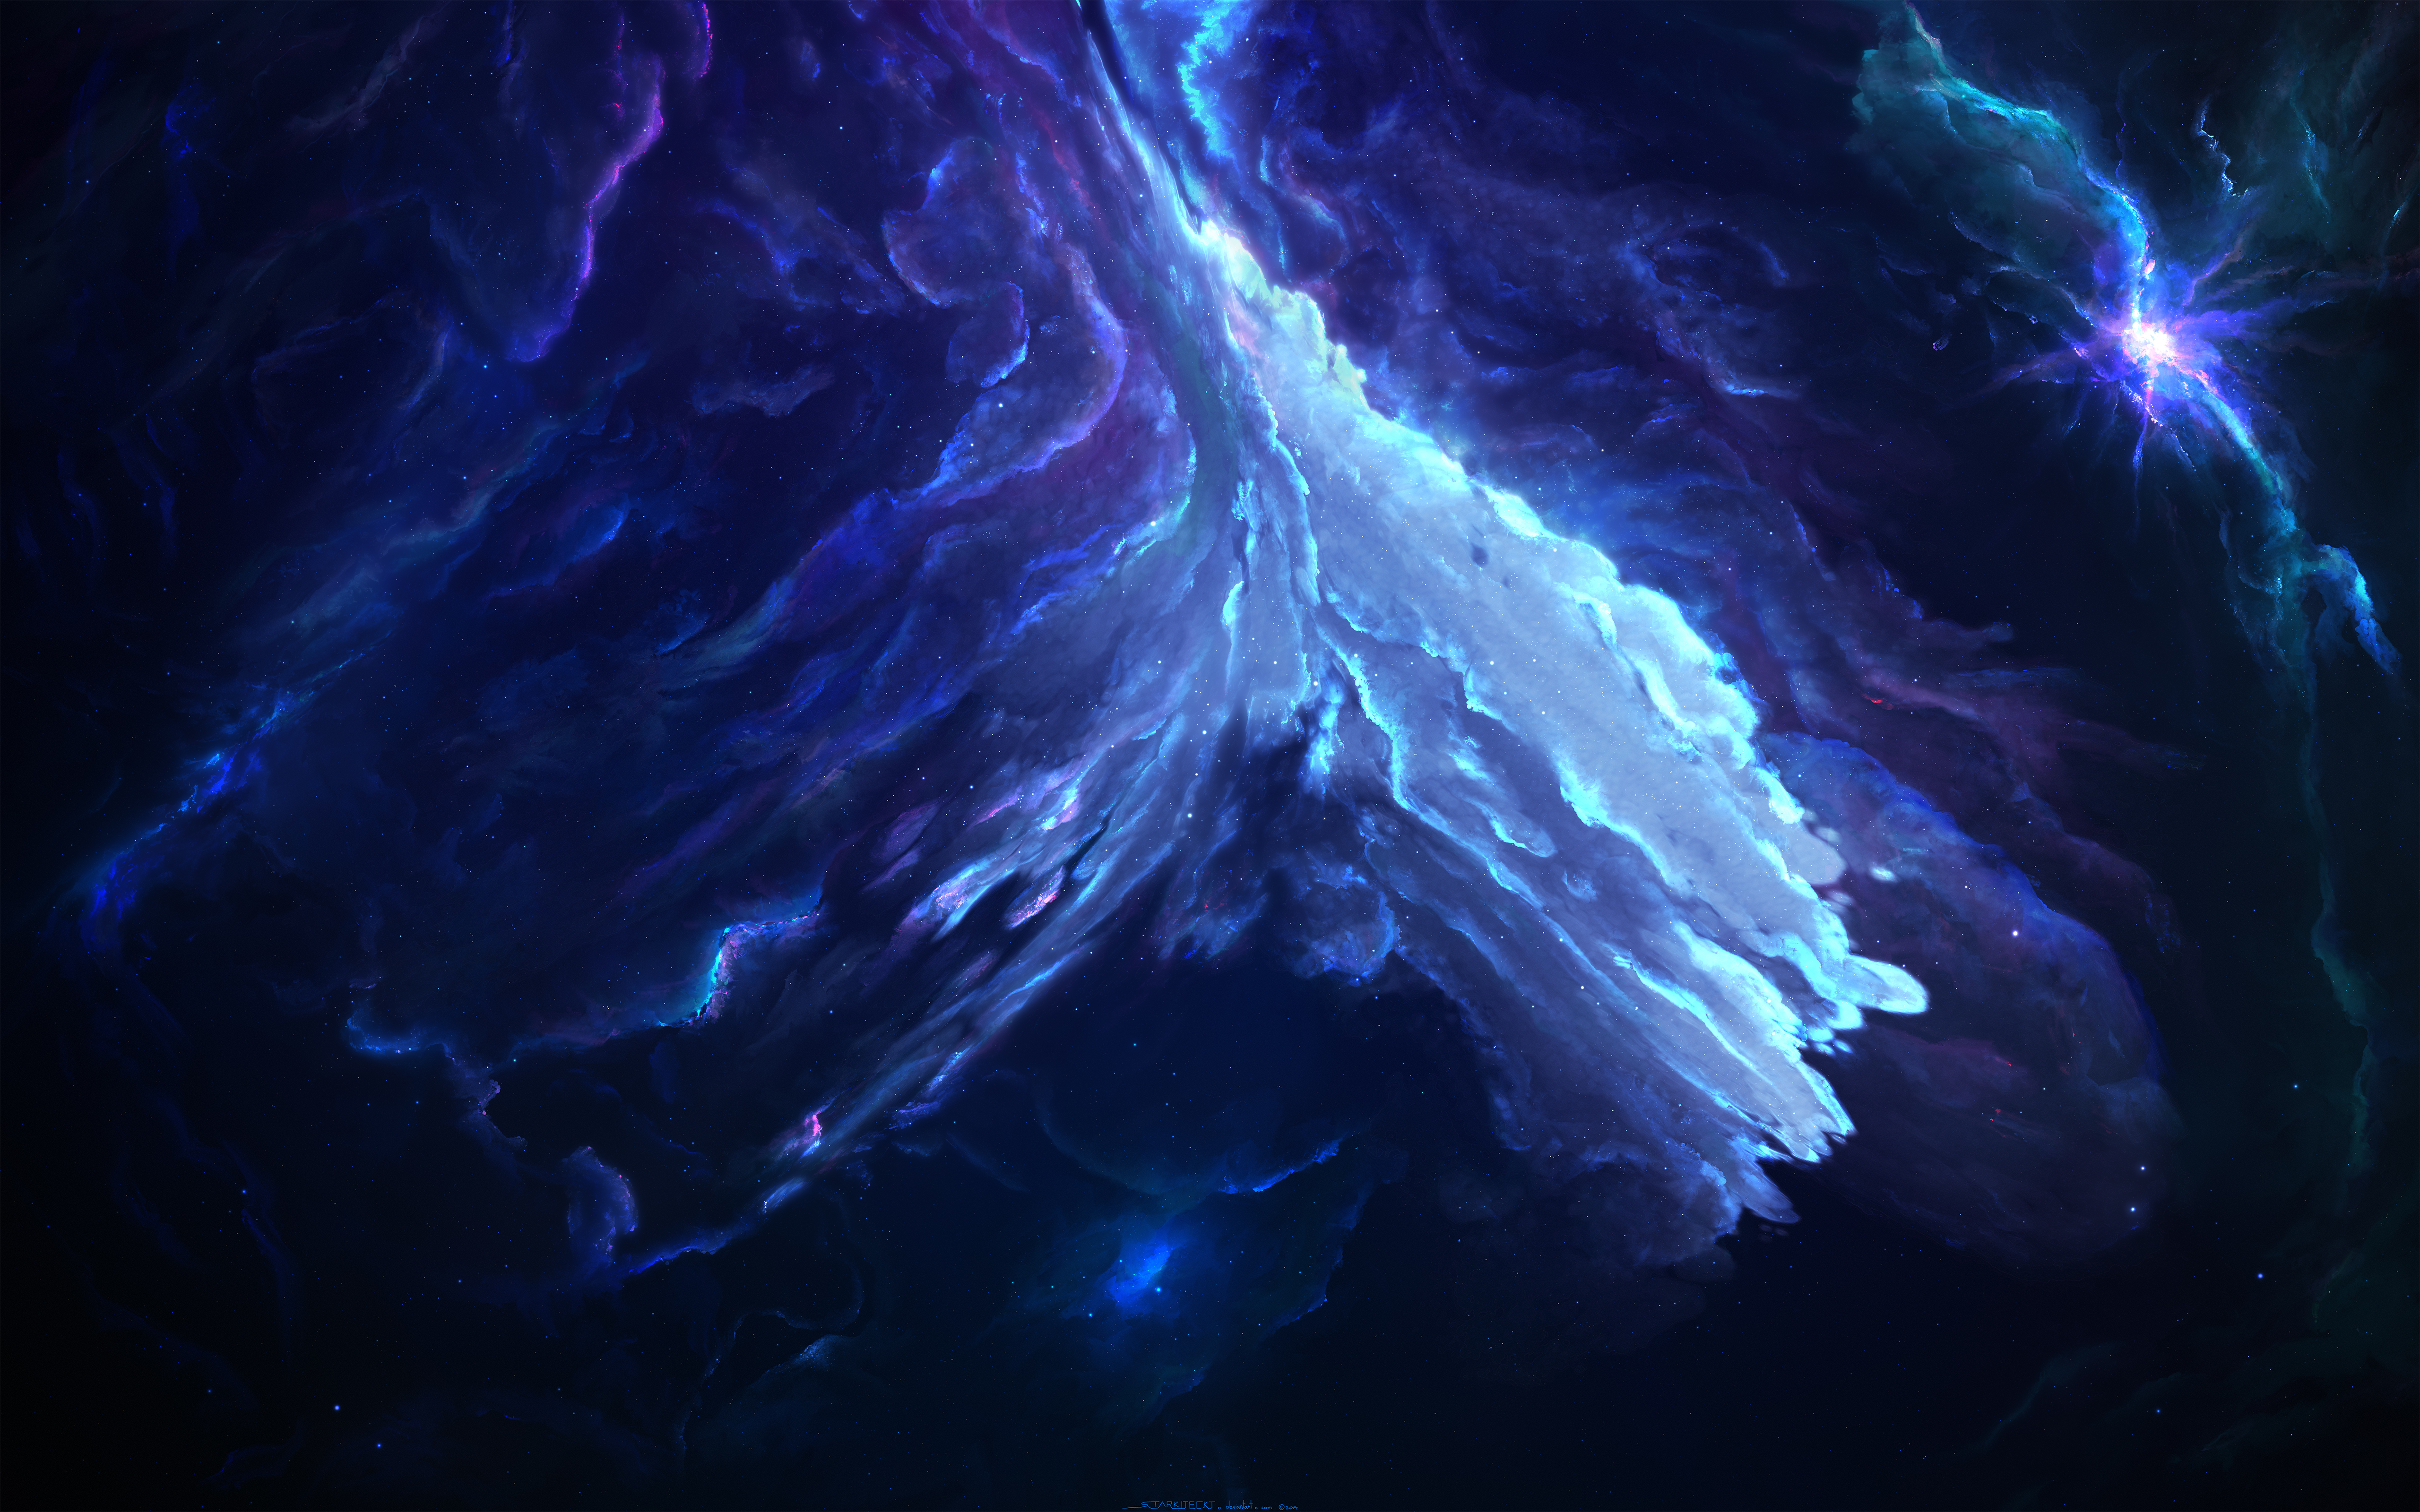 5120x3200px nebula 4k wallpaper wallpapersafari - 5120x3200 resolution ...